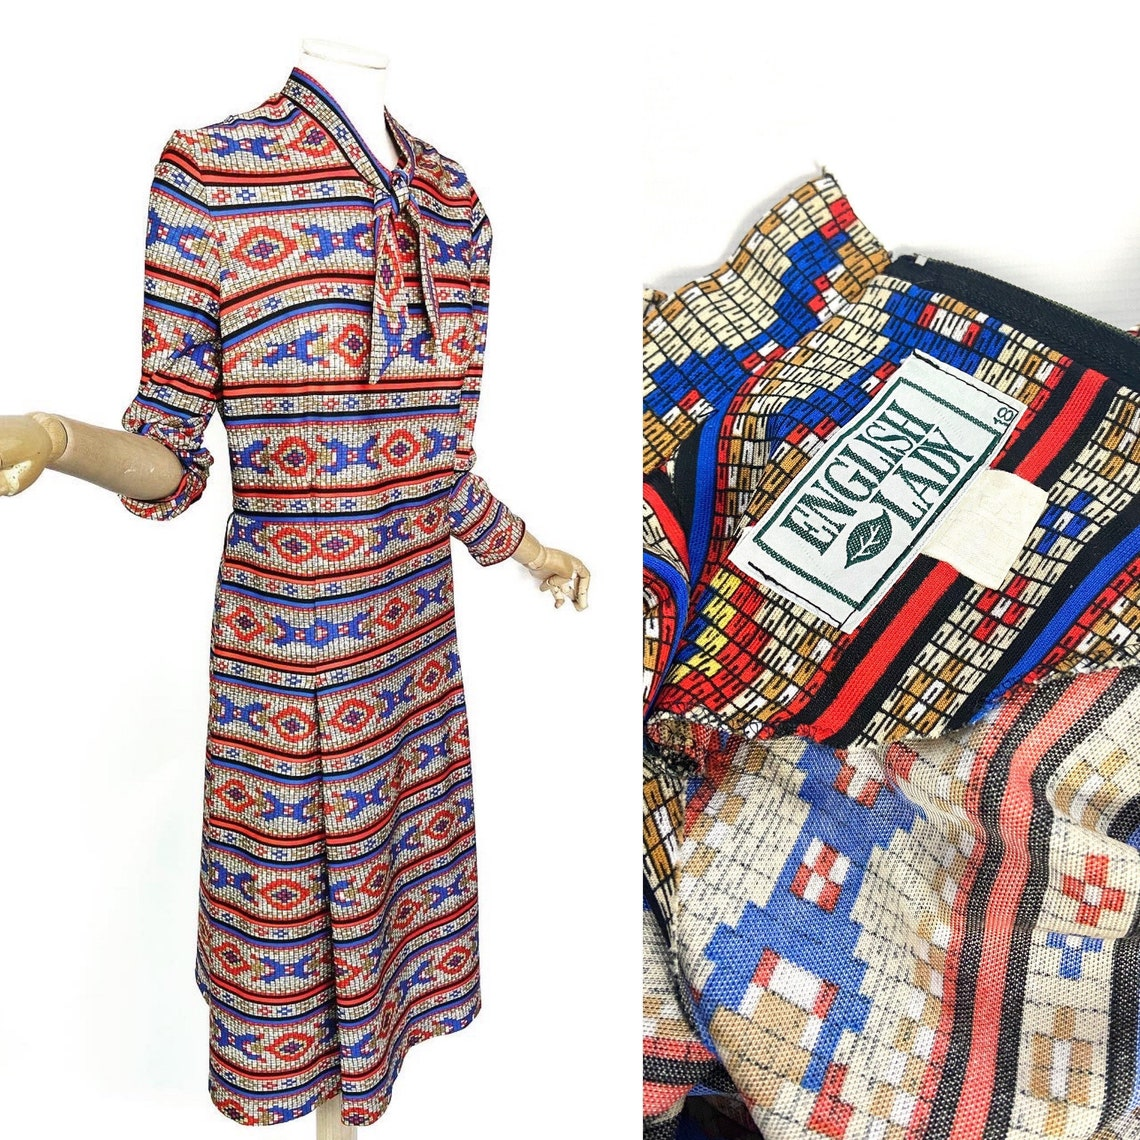 Colourful 70s/80s secretary style vintage dress. Vintage